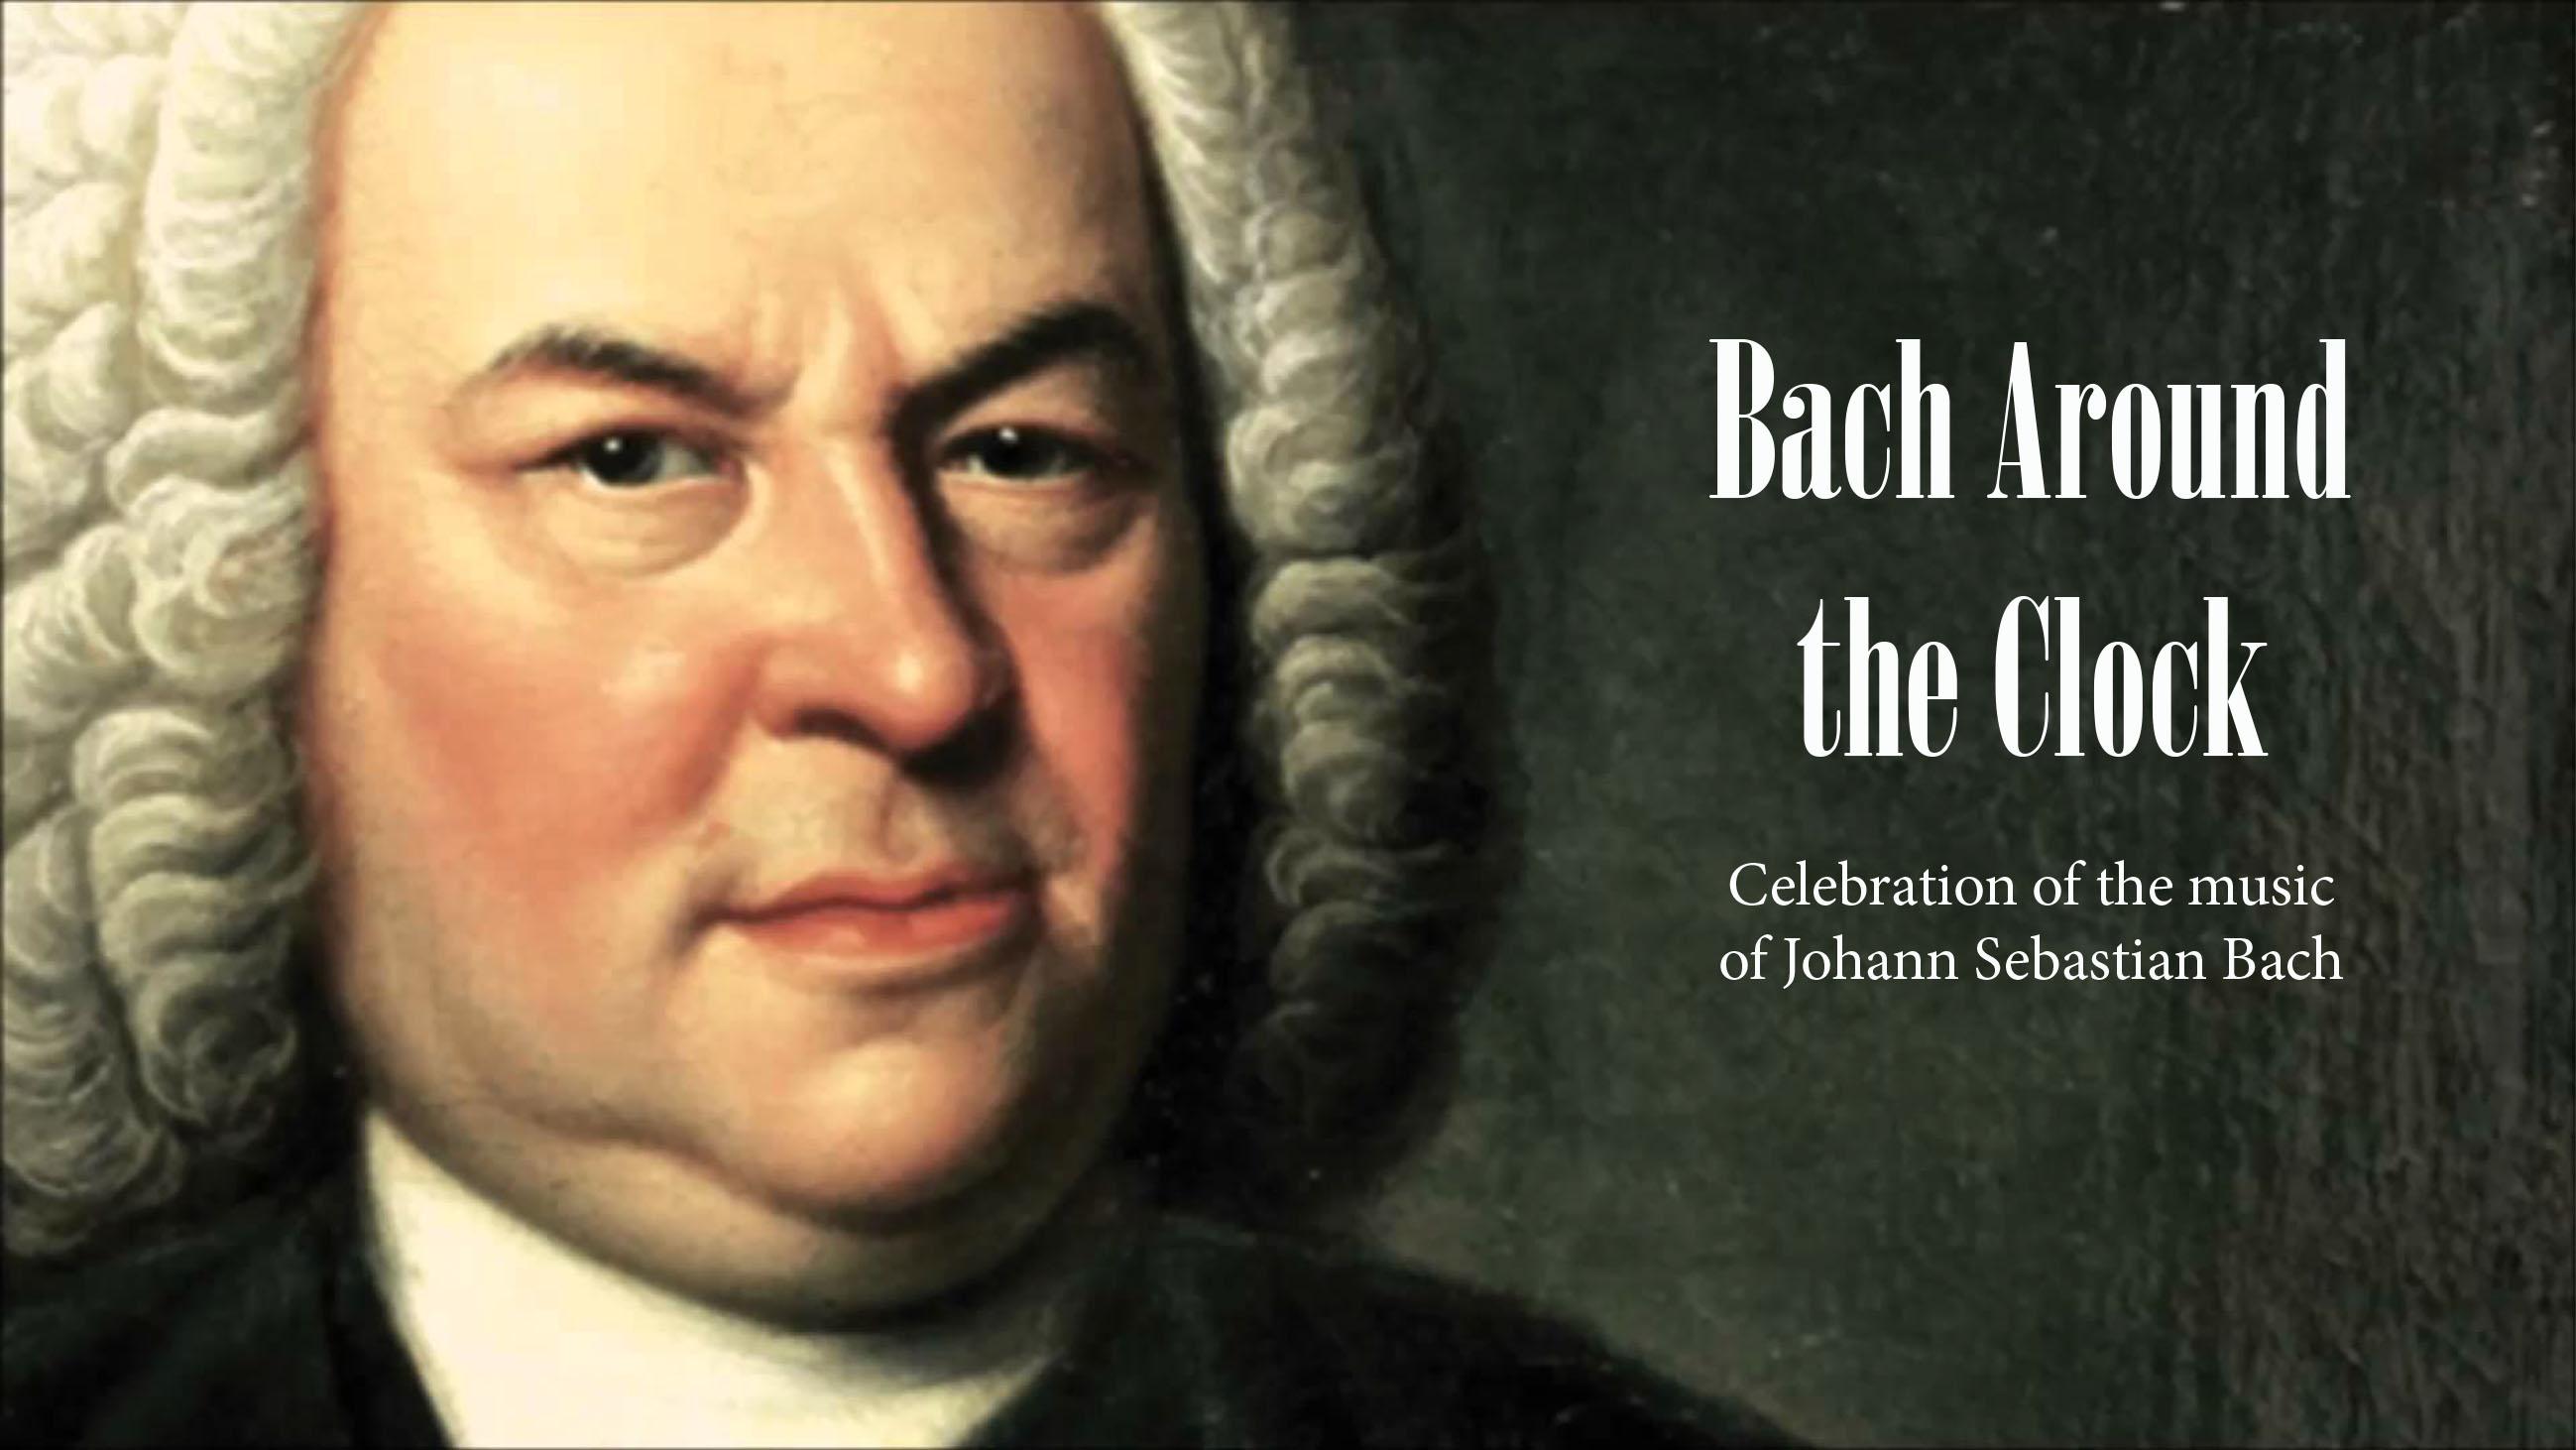 SAL_Bach-Around-Clock.jpg